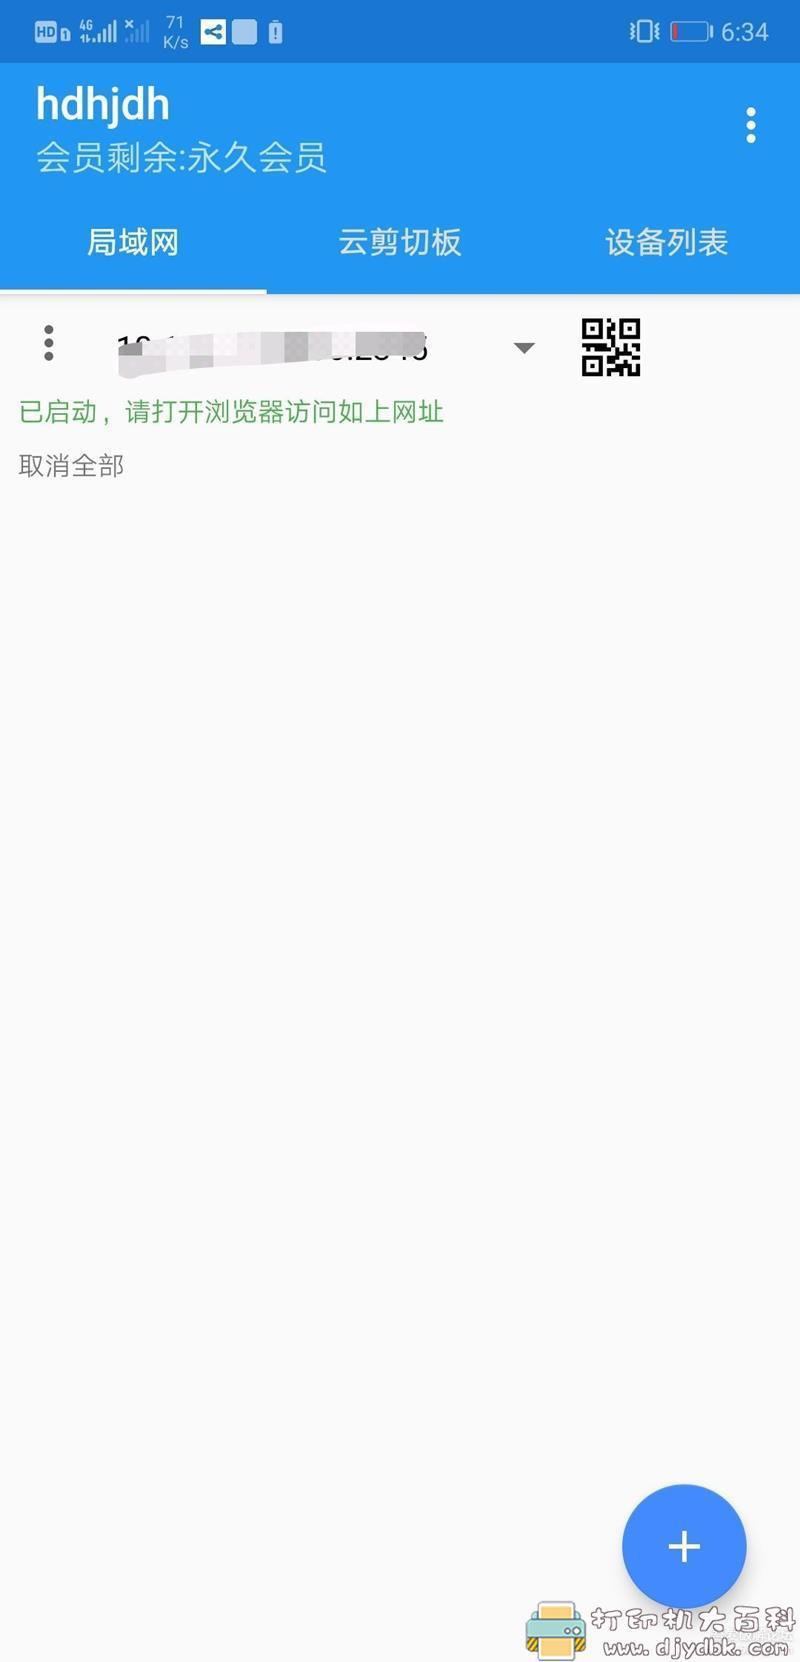 [Android]局域网精灵-专业版图片 No.1